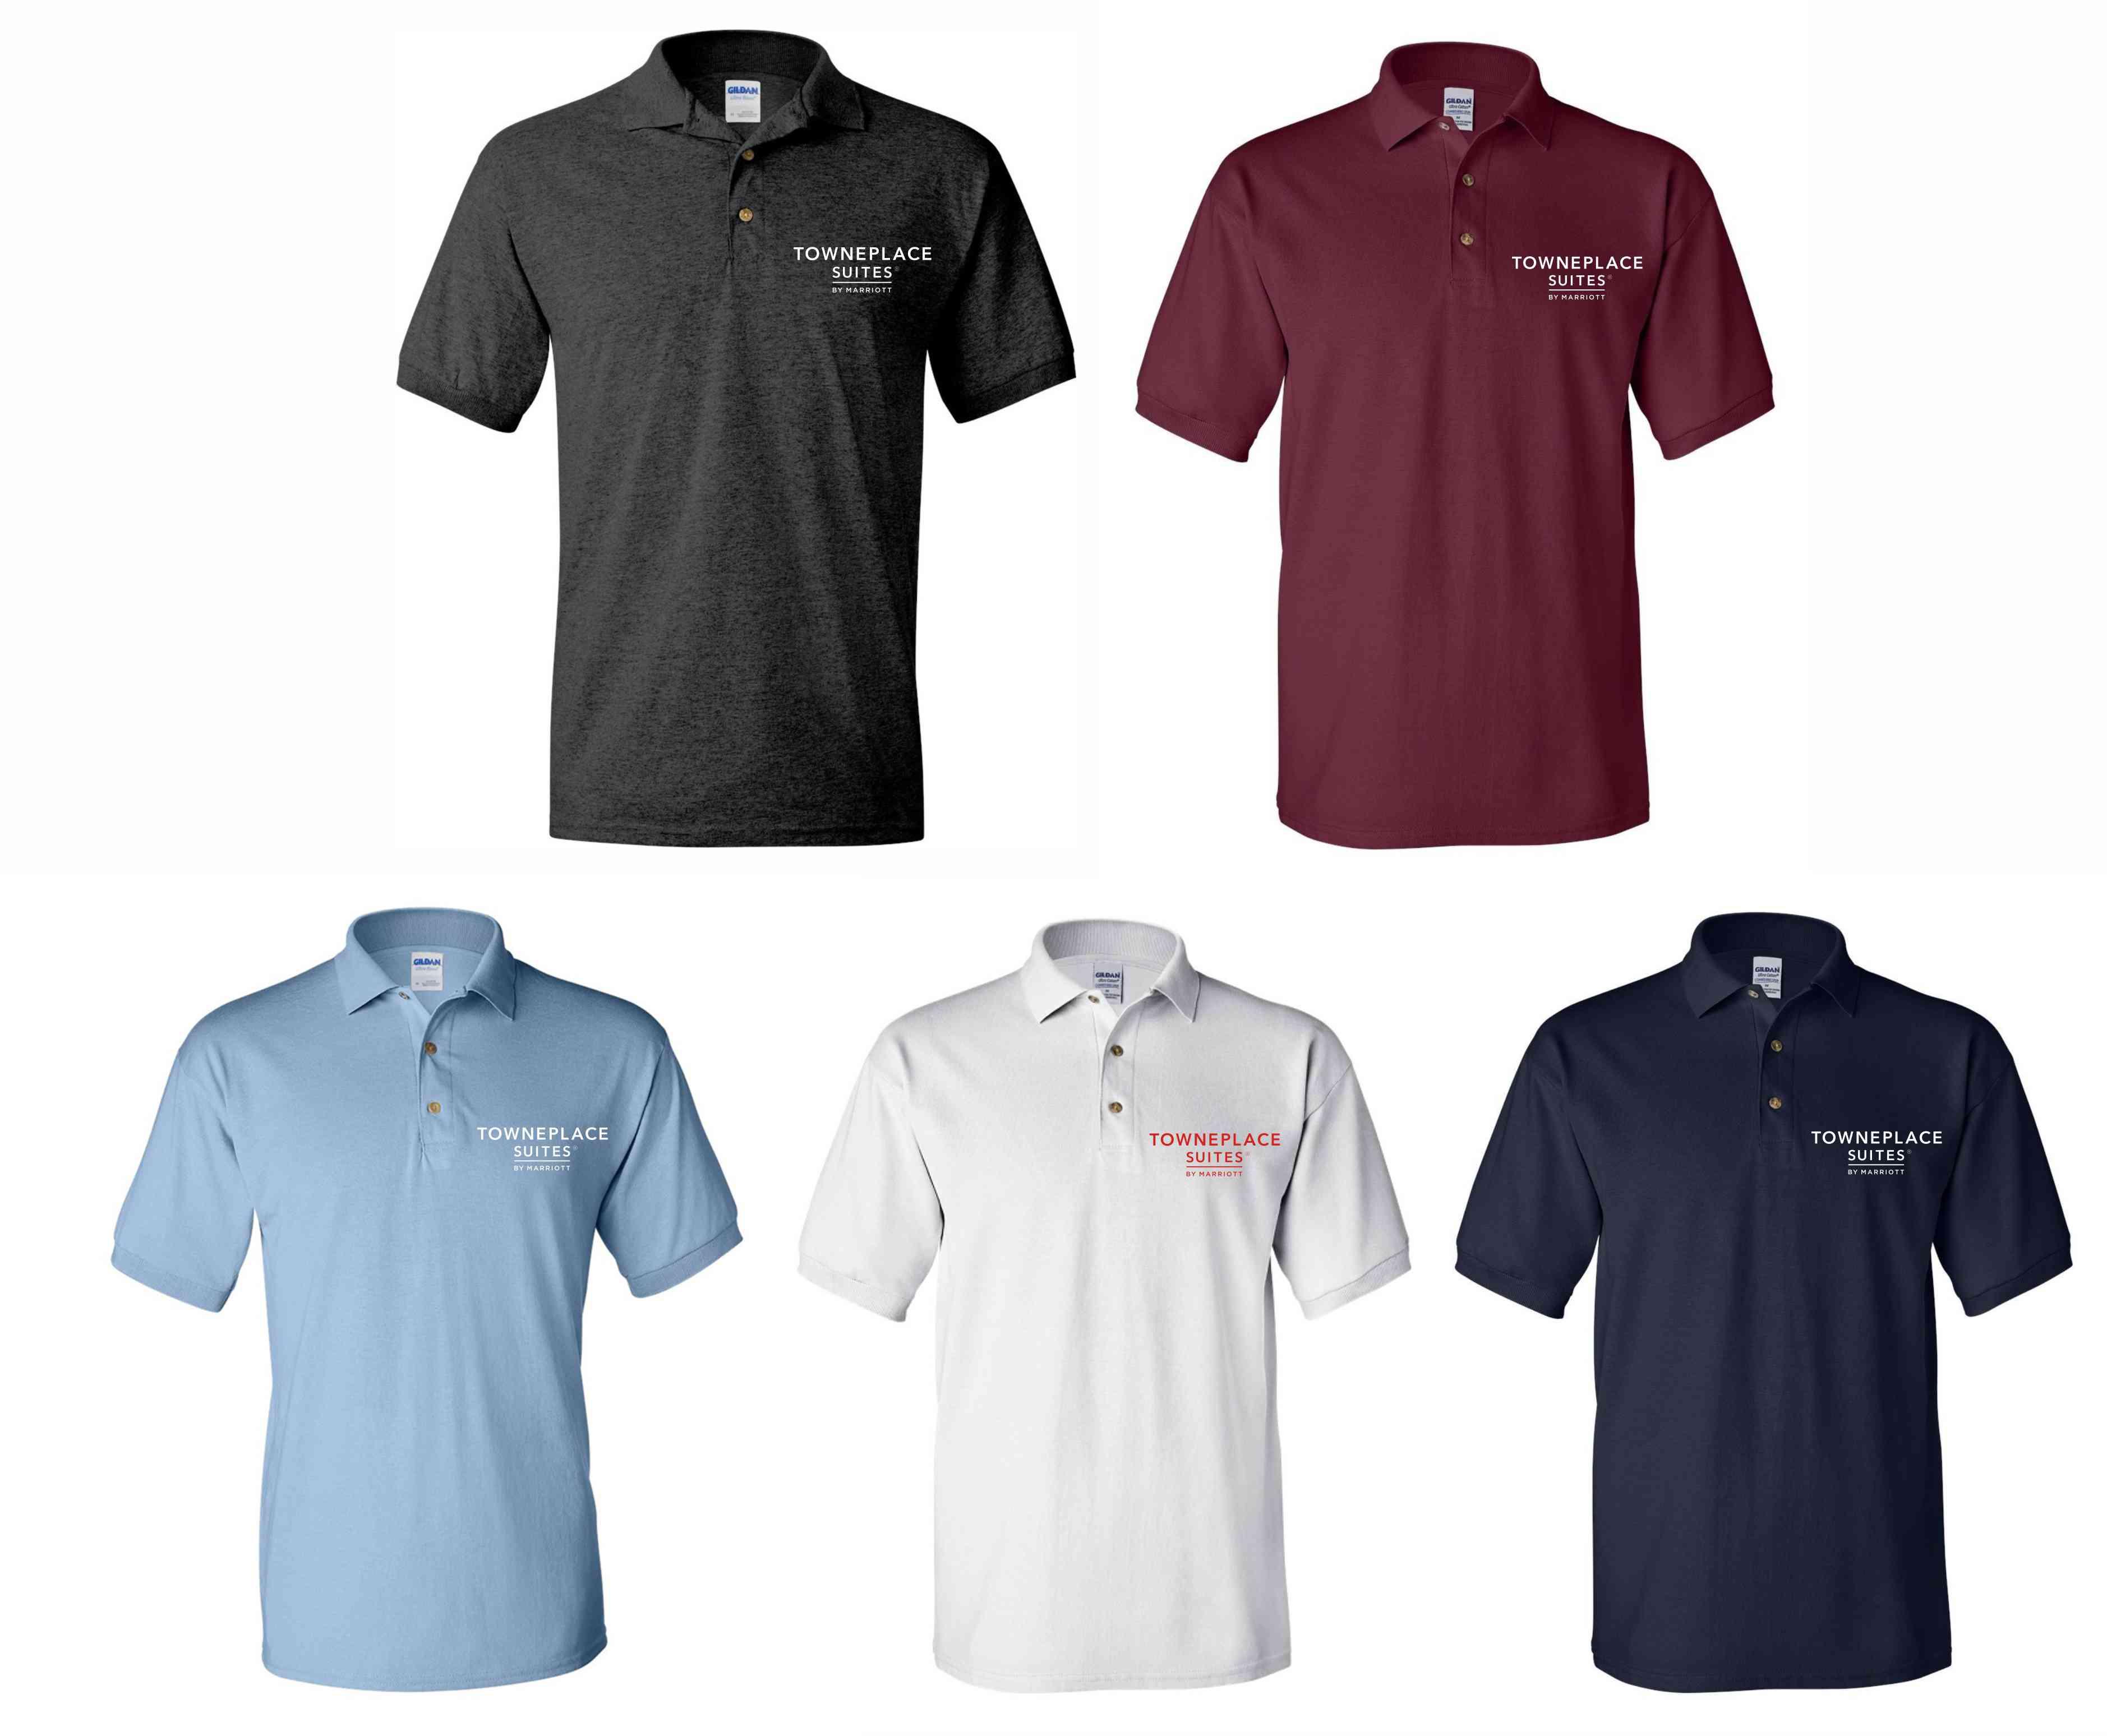 Polo Shirts. Dark Heather, Maroon, Light Blue, White and Navy Blue. - Silk-Screen Logo - DryBlend Fabric 50/50 - 3-Button Placket - Knitted Collar/Cuffs